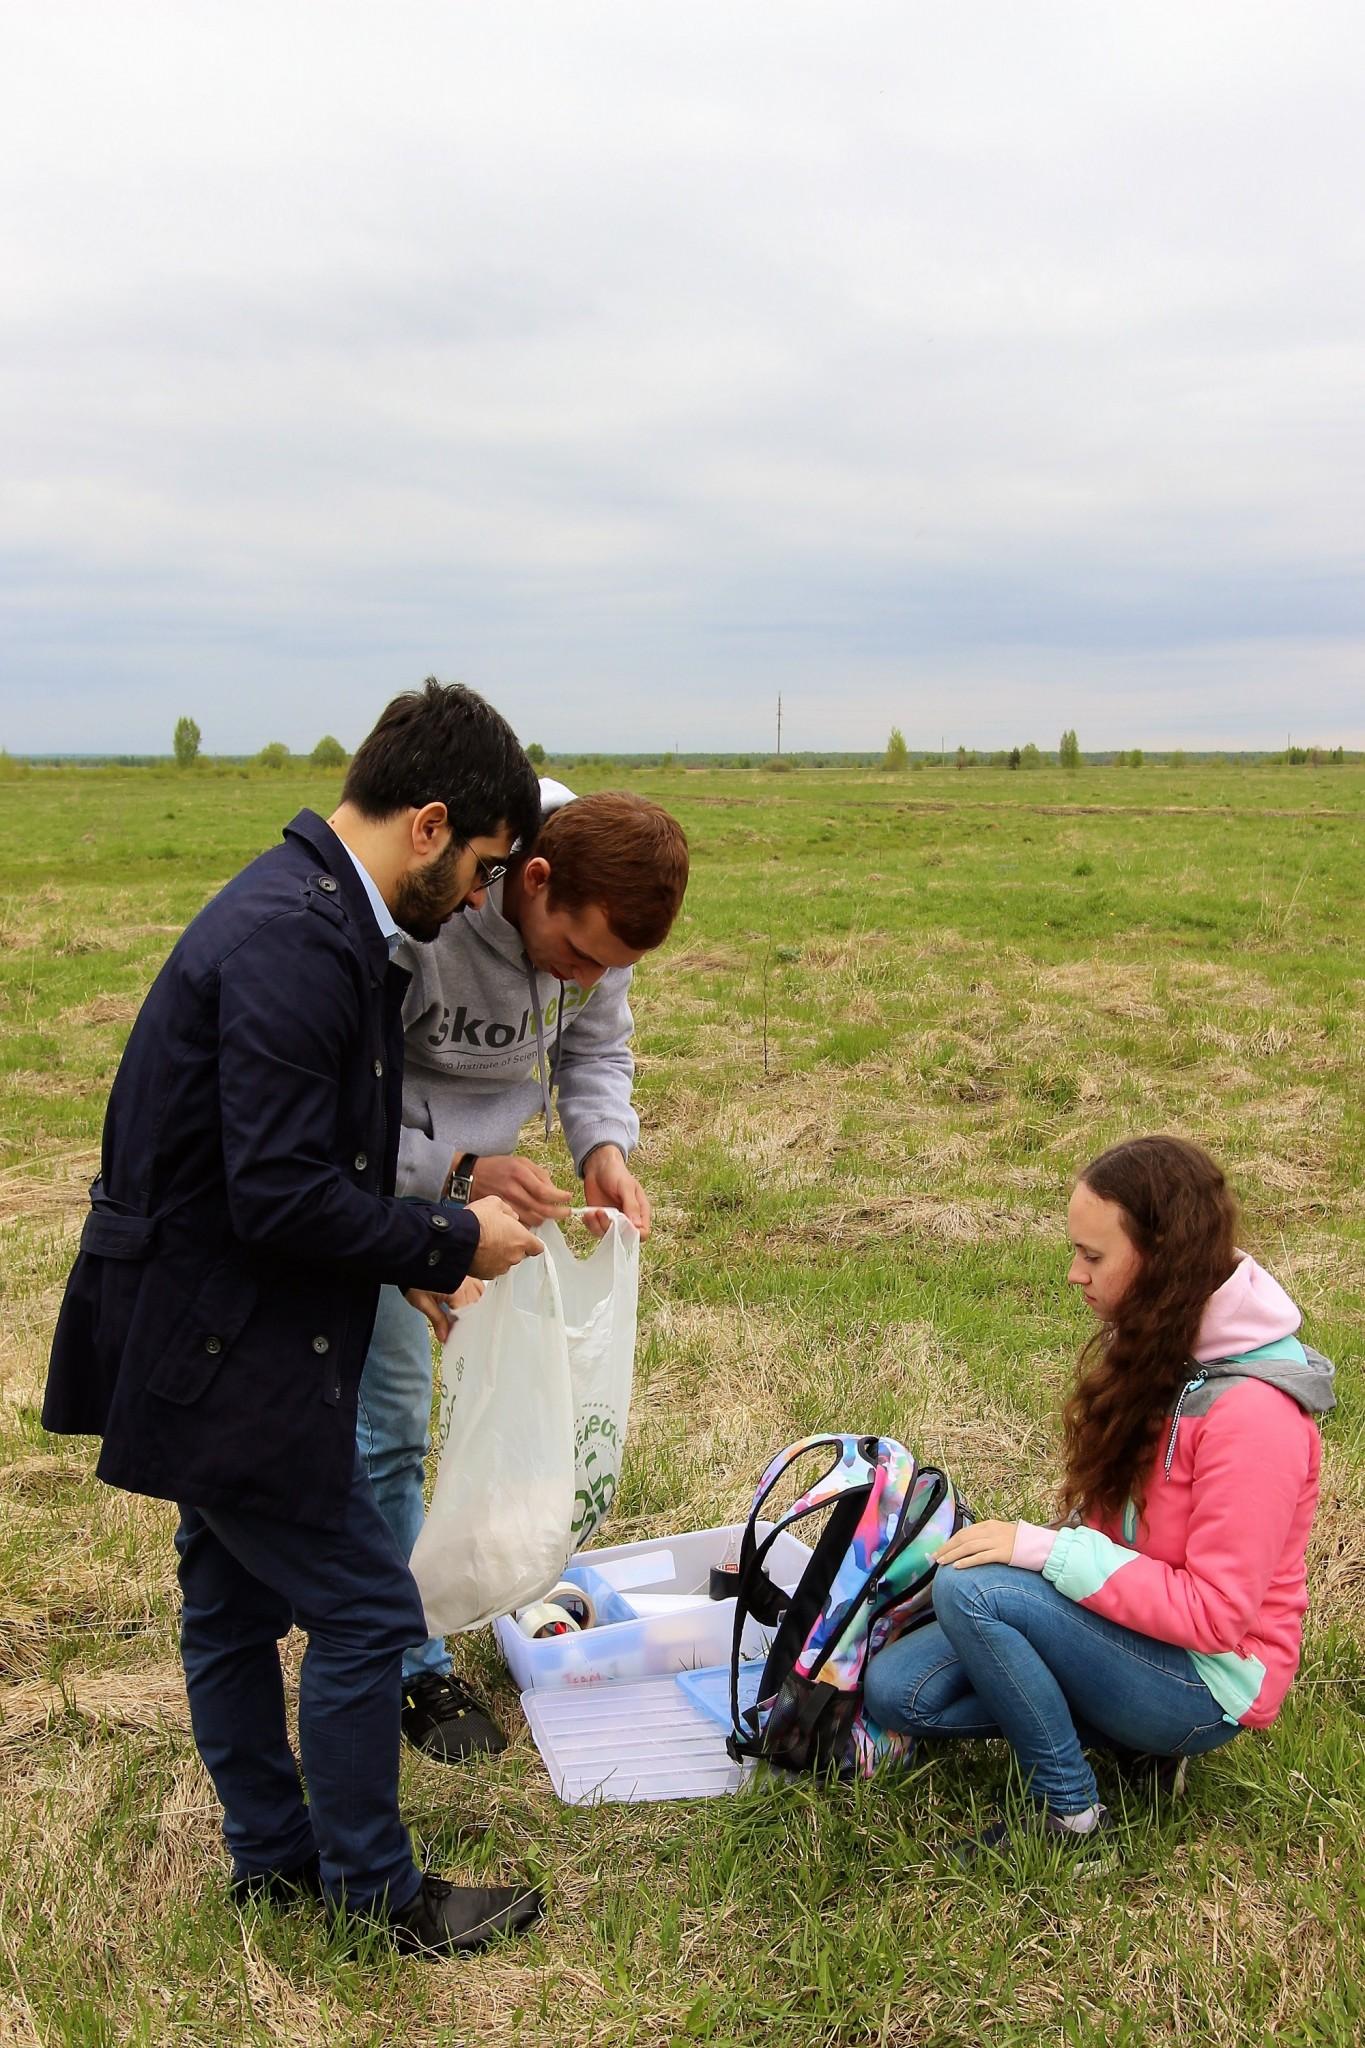 Nicola Garzaniti, Shamil Biktimirov and Olga Danko search for parts. Photo: Skoltech.